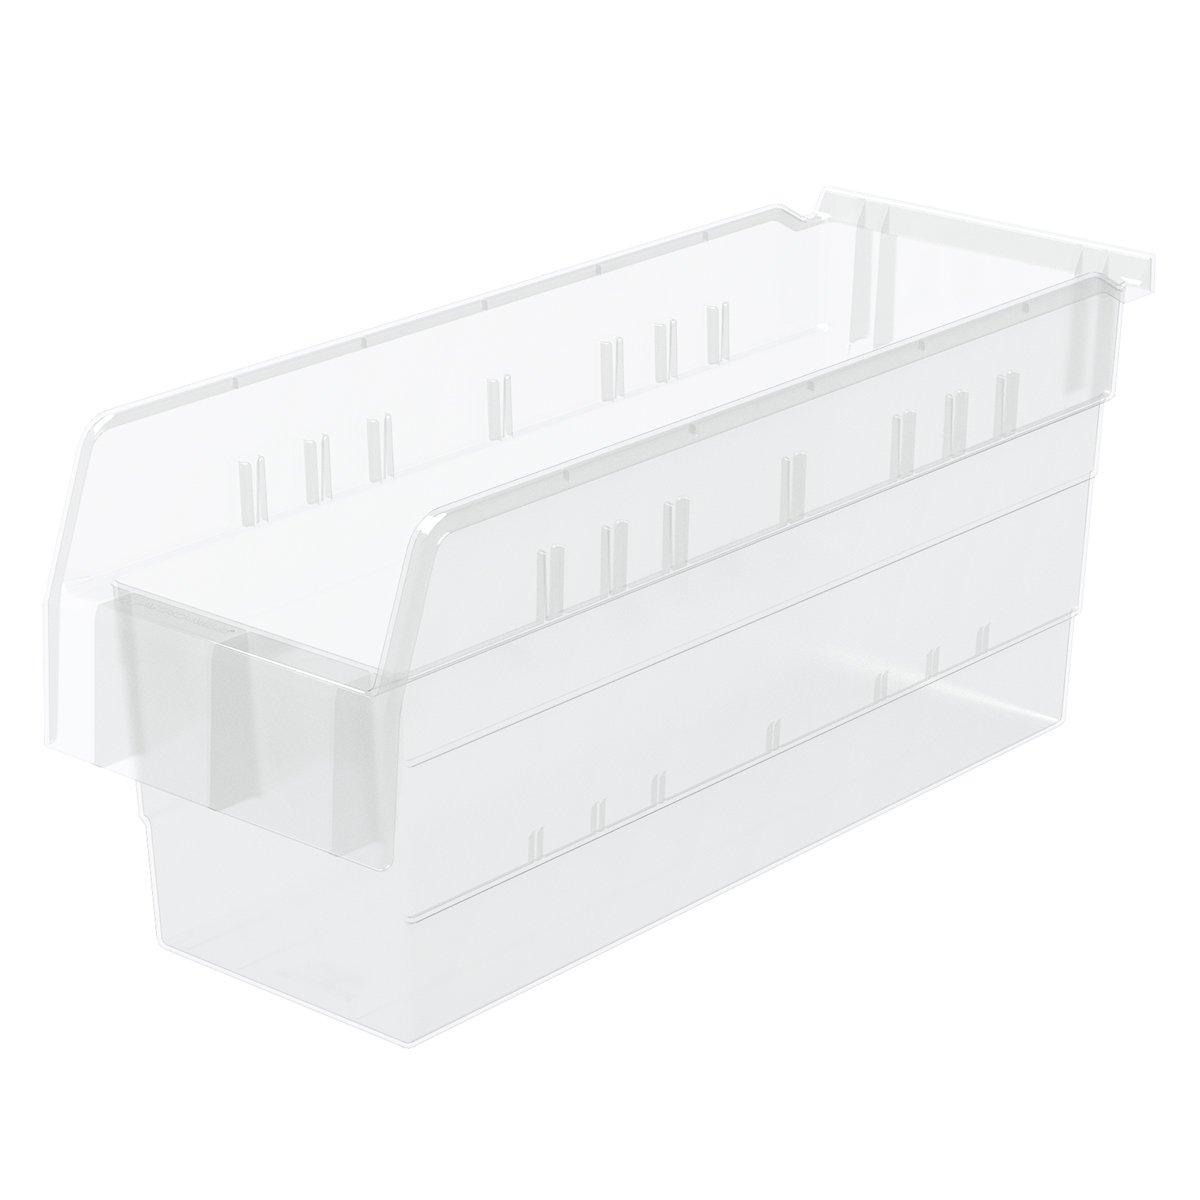 Akro-Mils 30868 ShelfMax 8 Plastic Nesting Shelf Bin Box, 18-Inch x 6-Inch x 8-Inch, Clear, 10-Pack